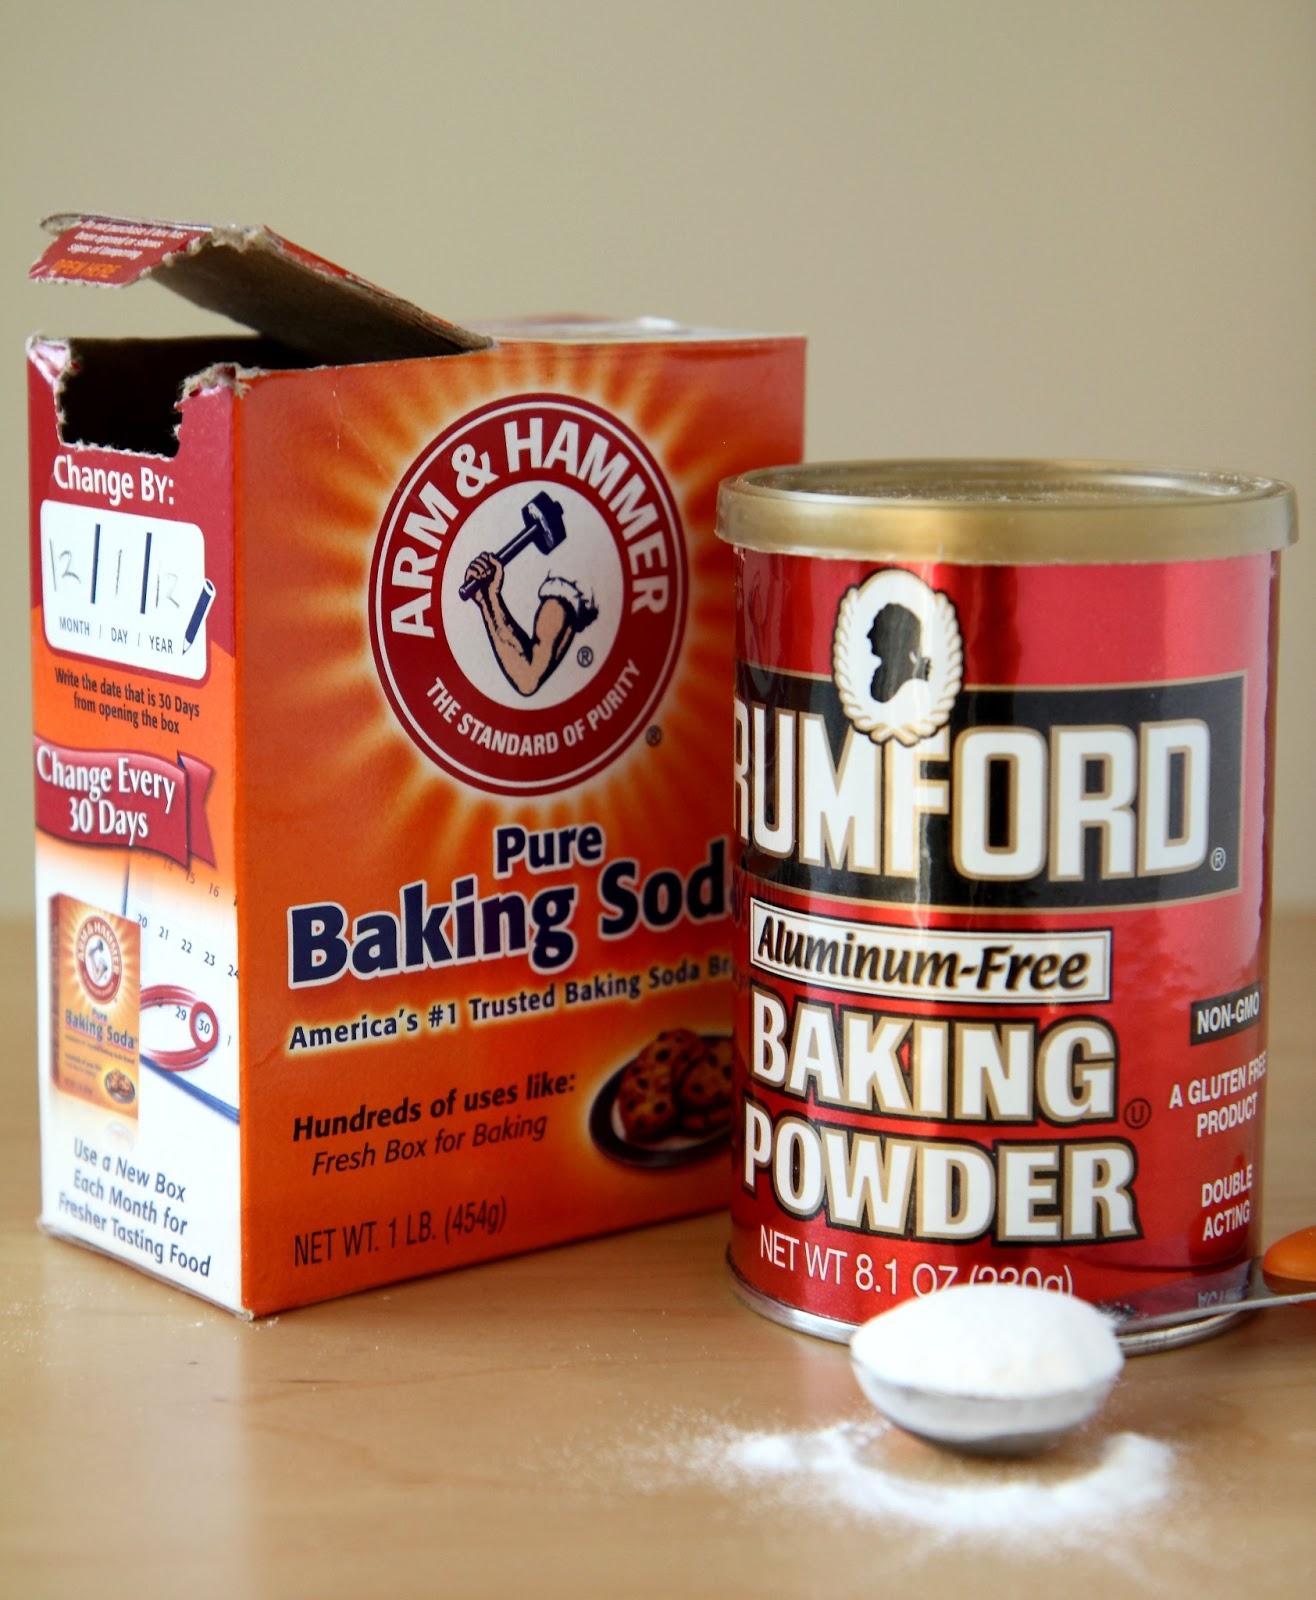 Verschil Baking Soda En Bakpoeder De Bakparade